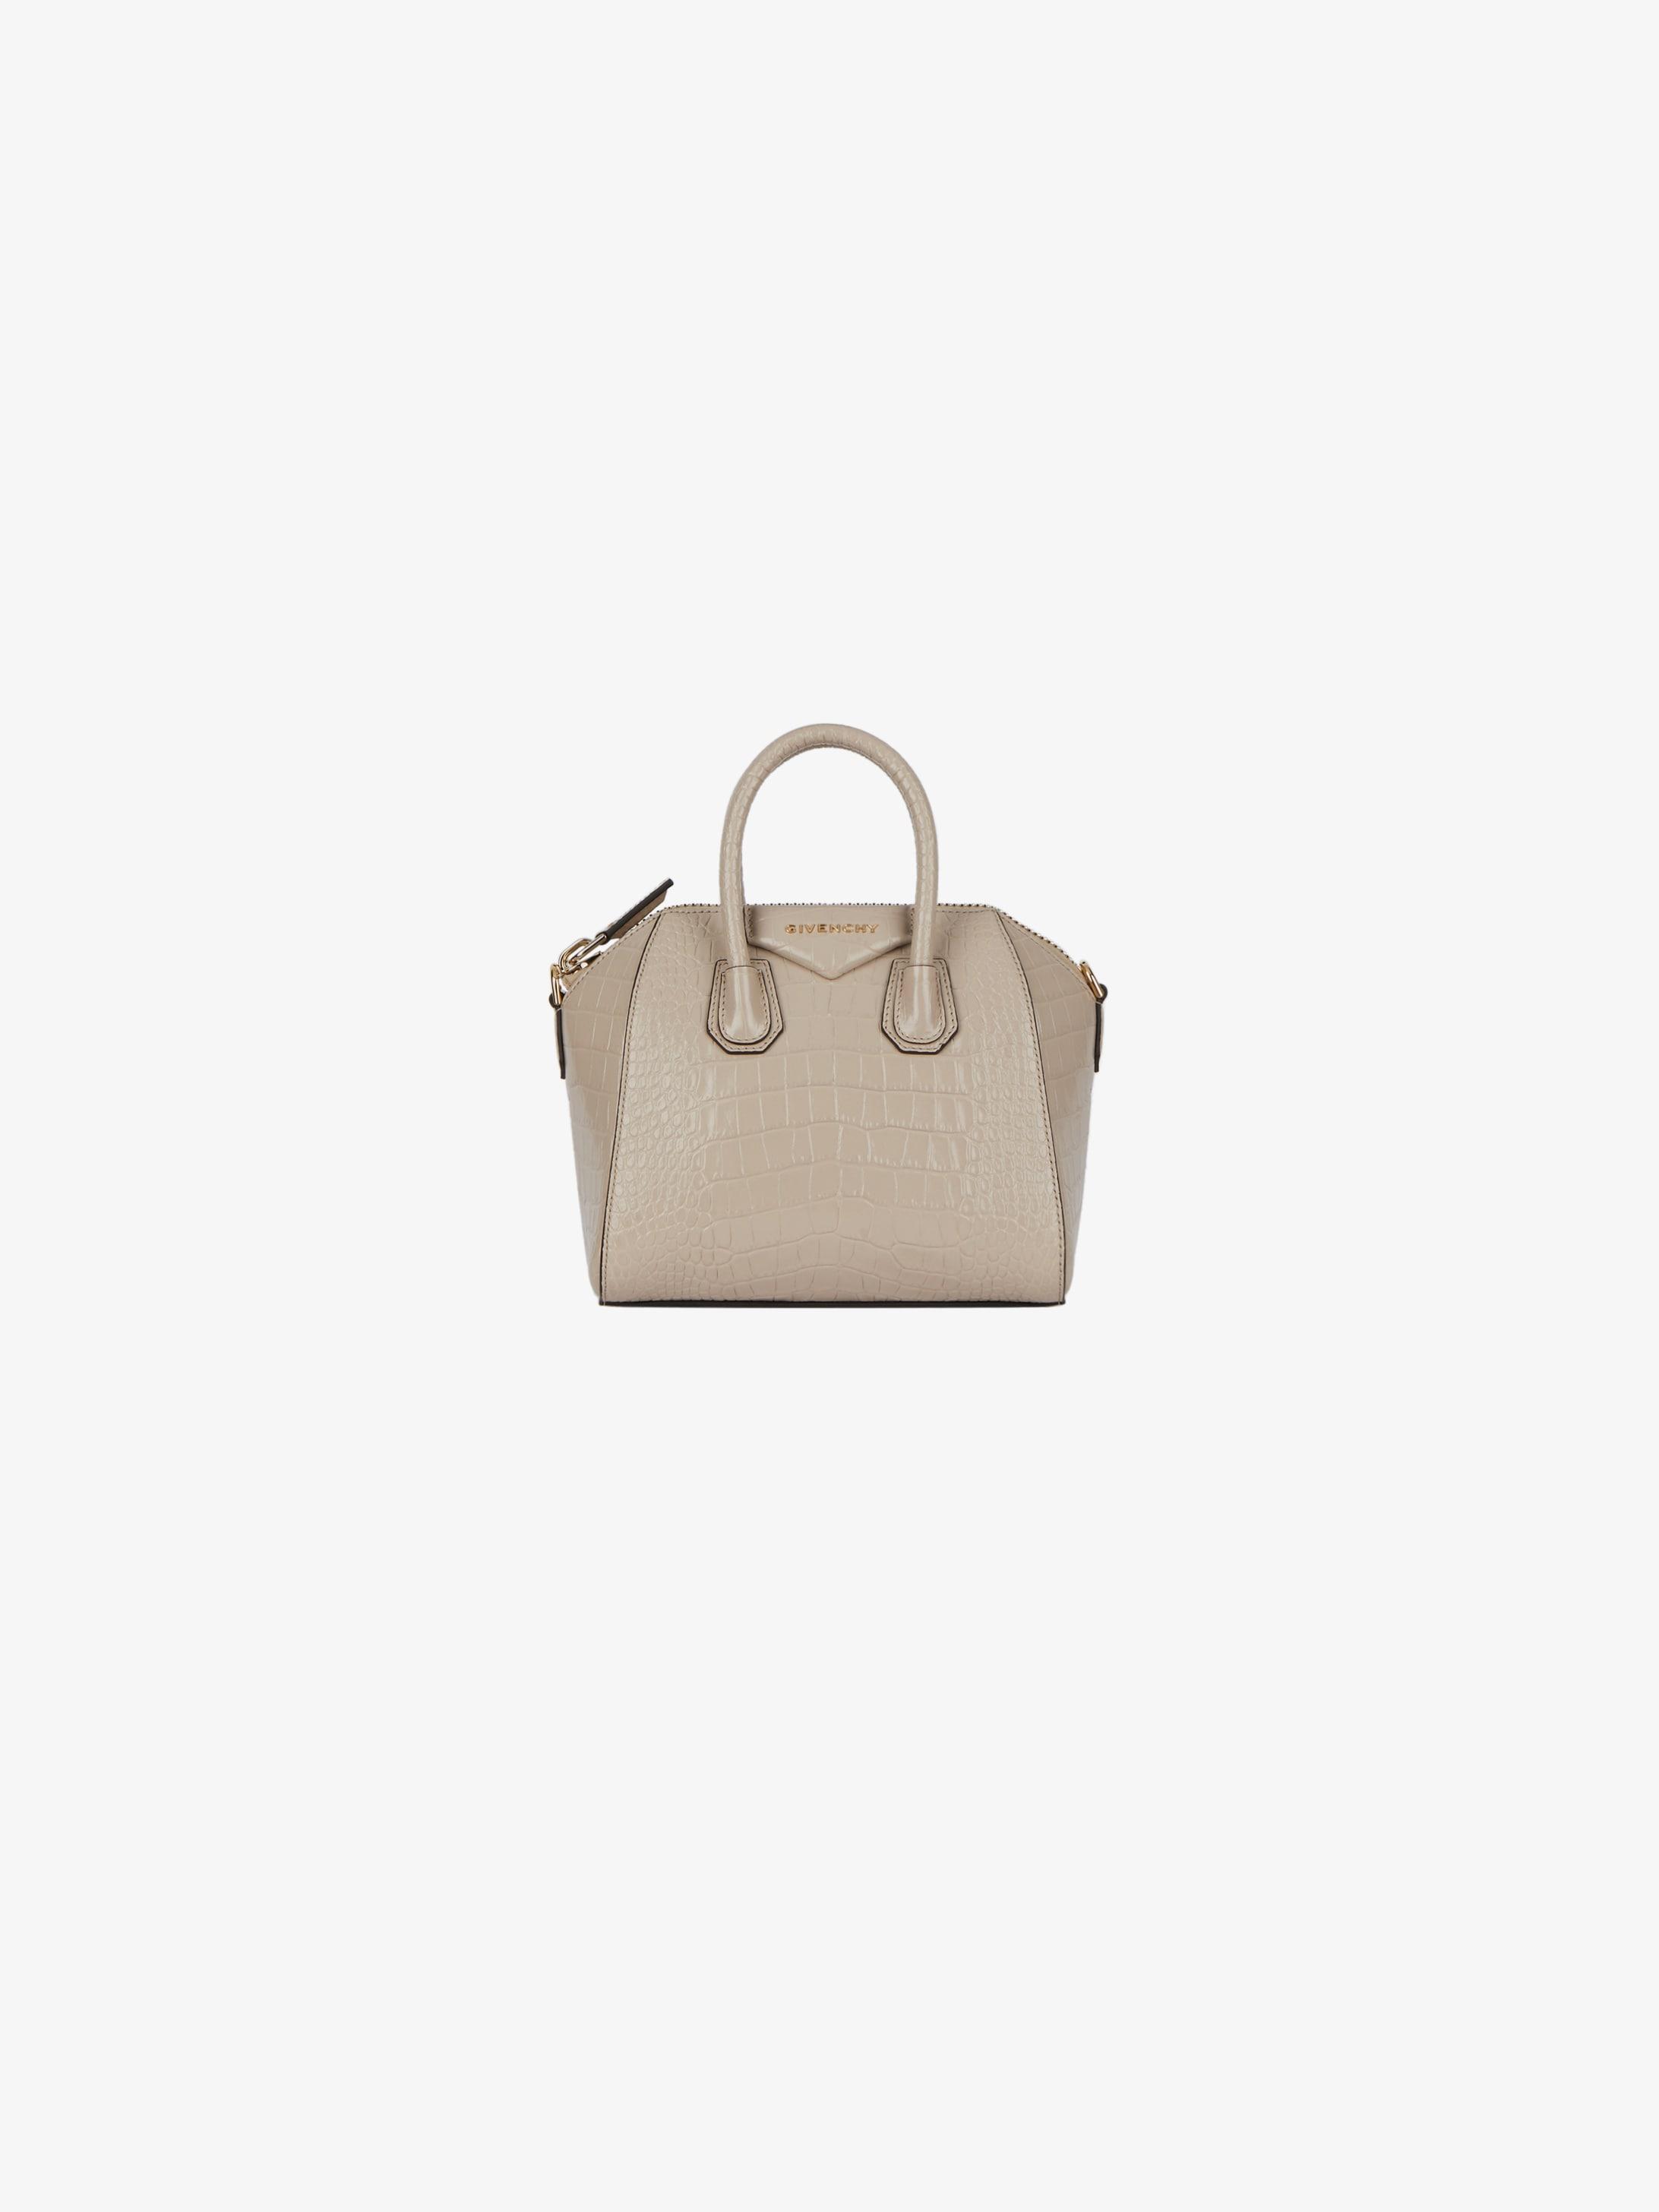 Mini Antigona bag in crocodile effect leather